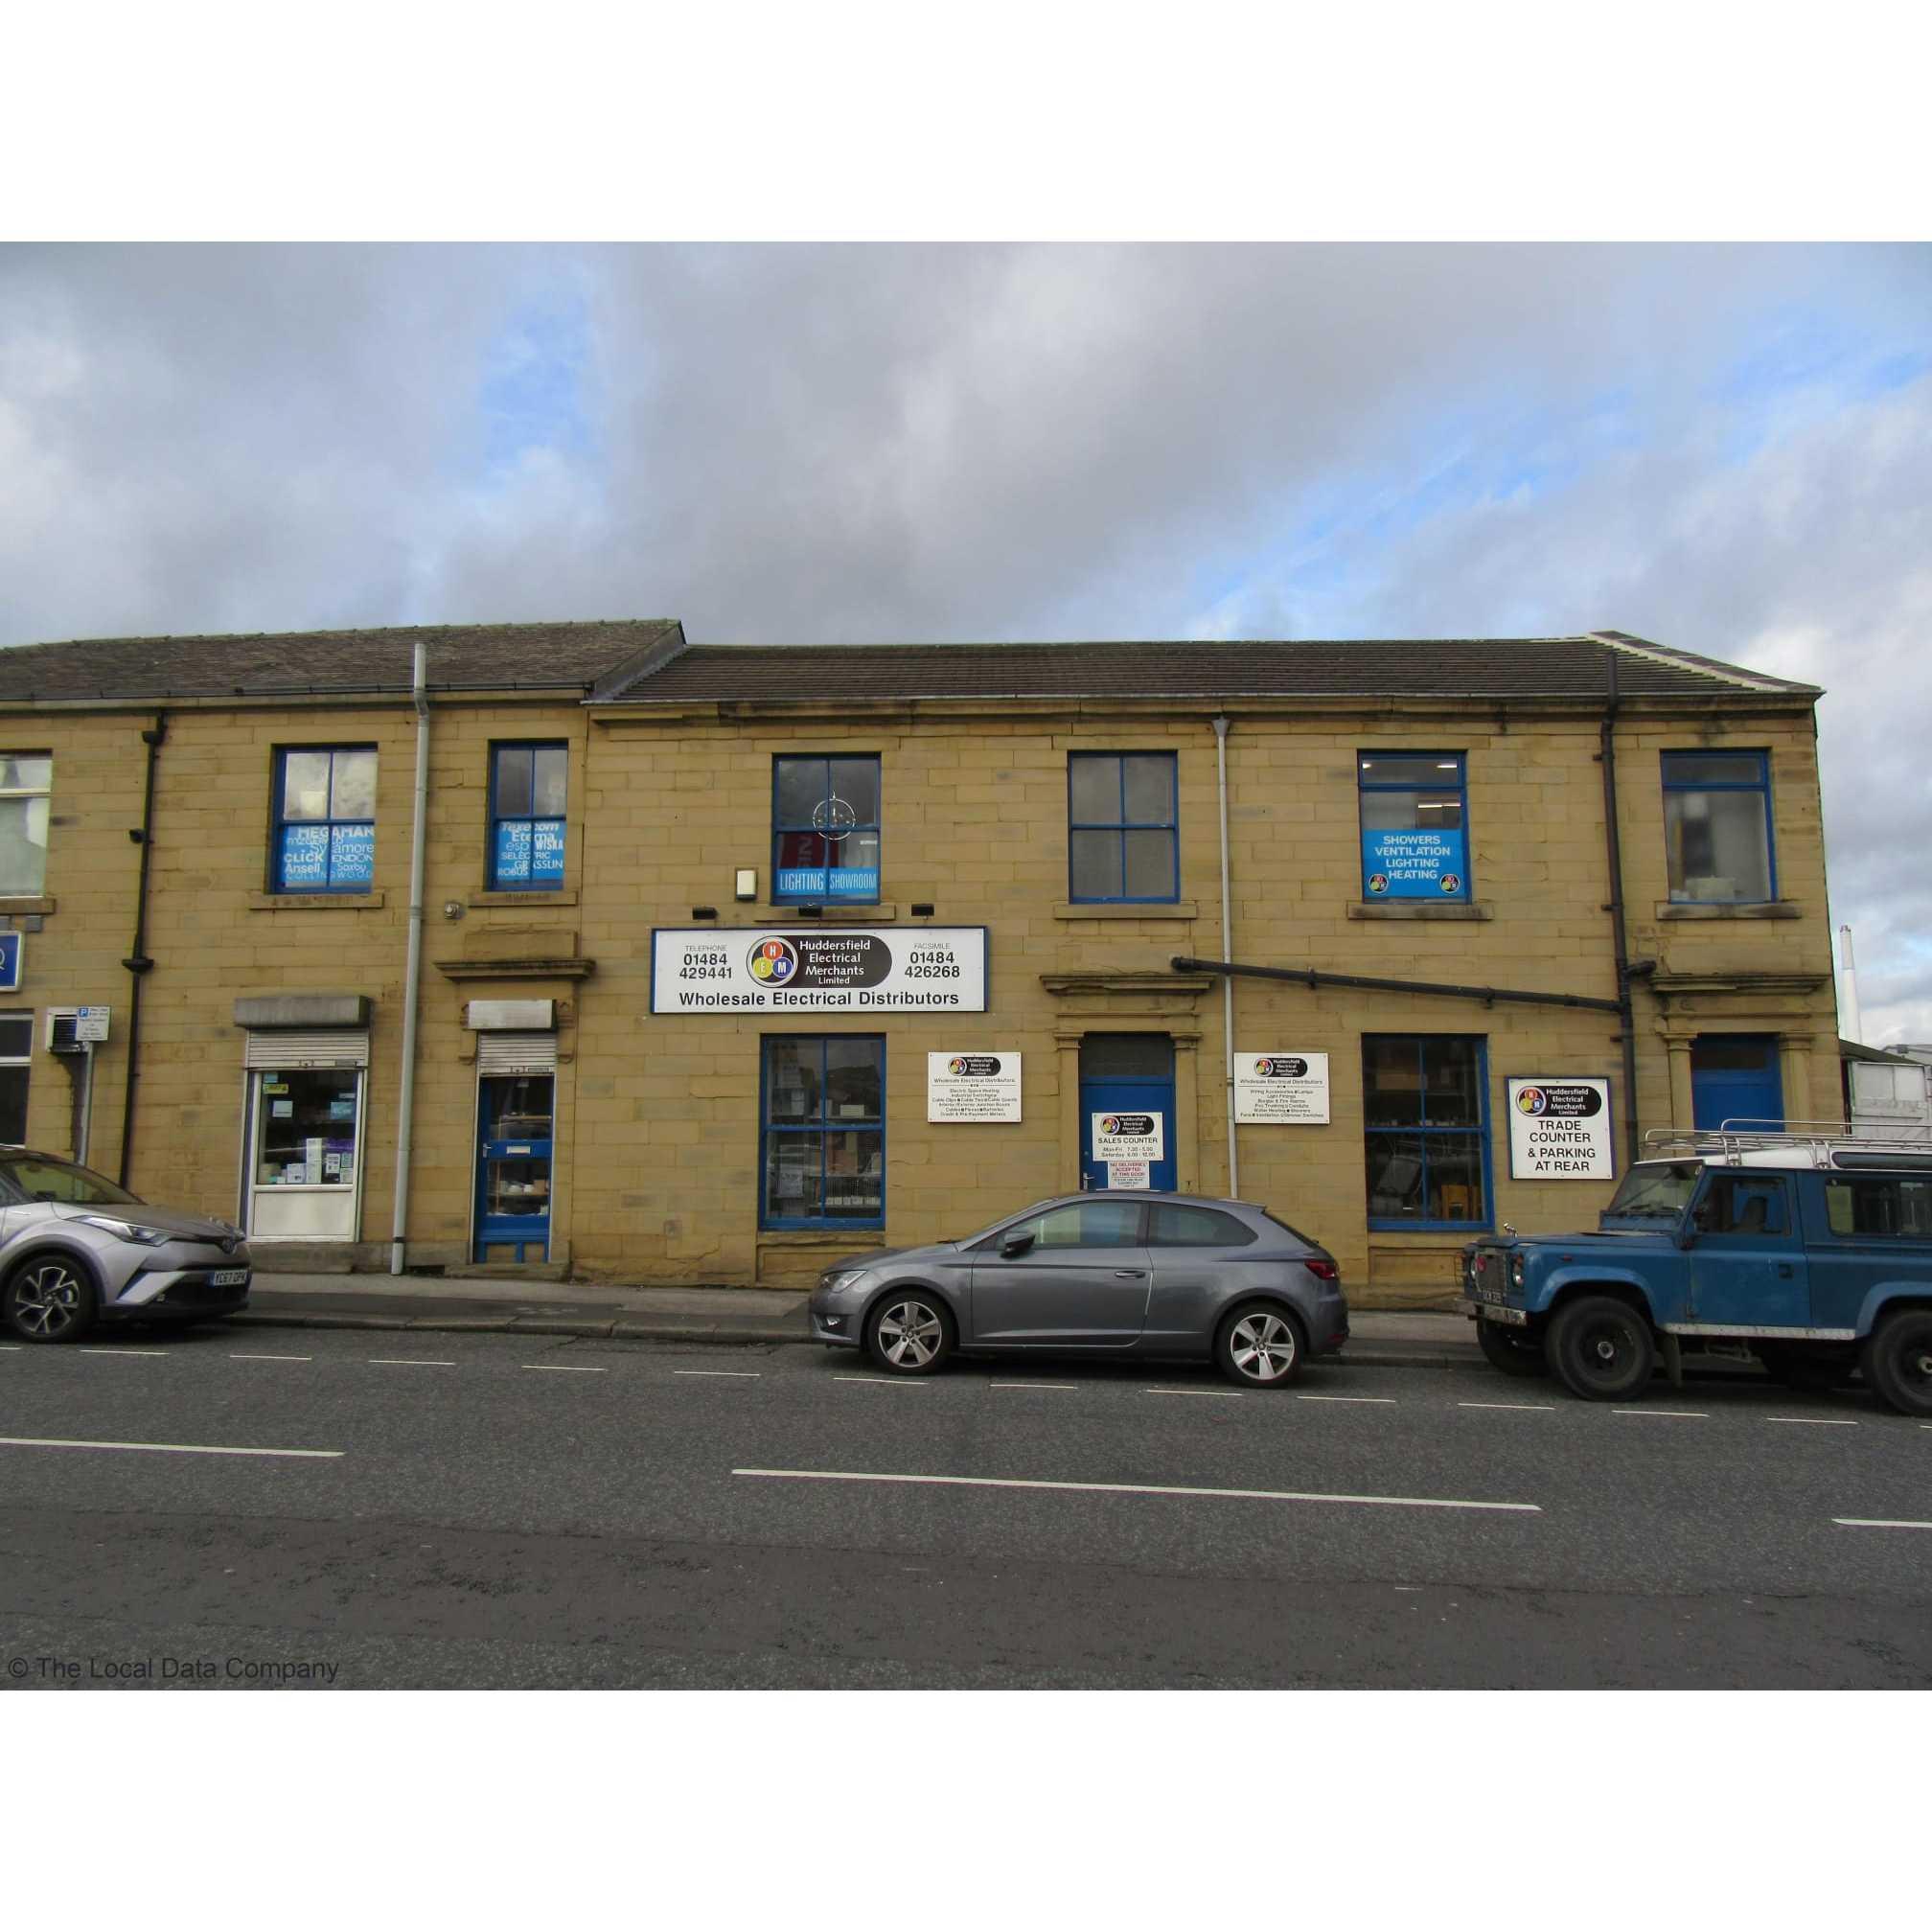 Huddersfield Electrical Merchants Ltd - Huddersfield, West Yorkshire HD1 6BE - 01484 429441 | ShowMeLocal.com